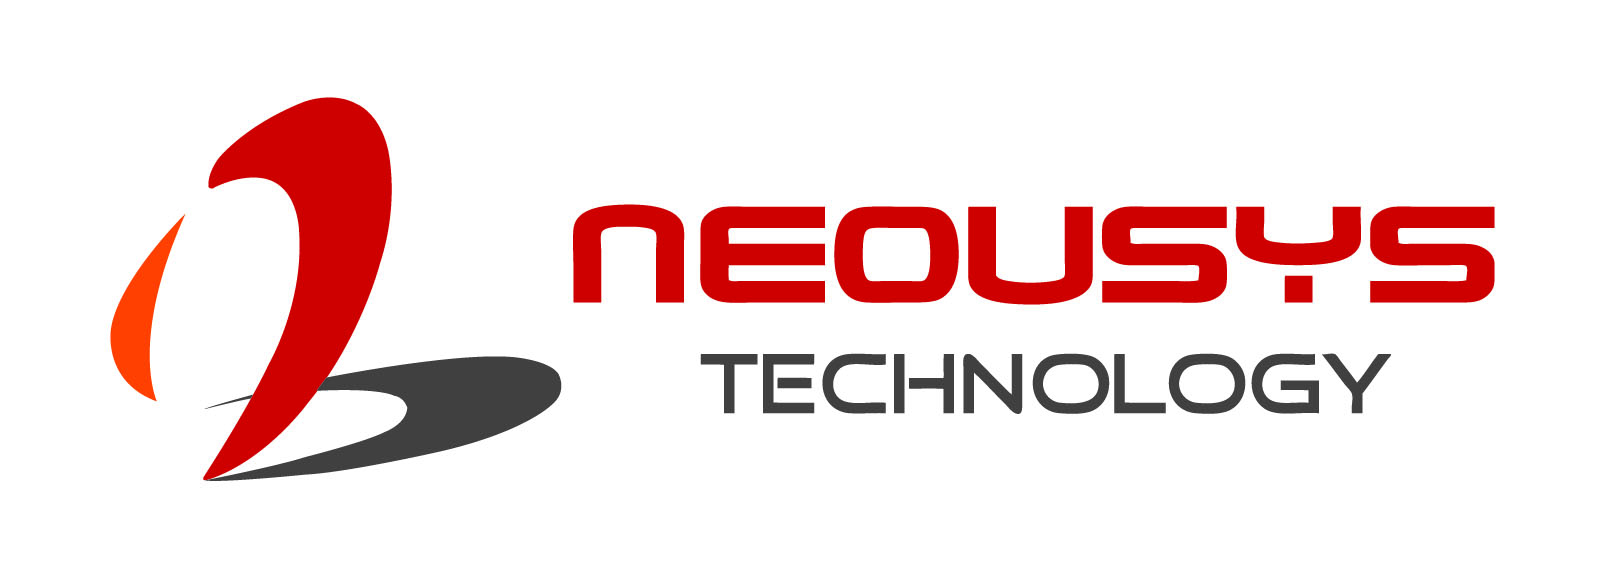 Neousys